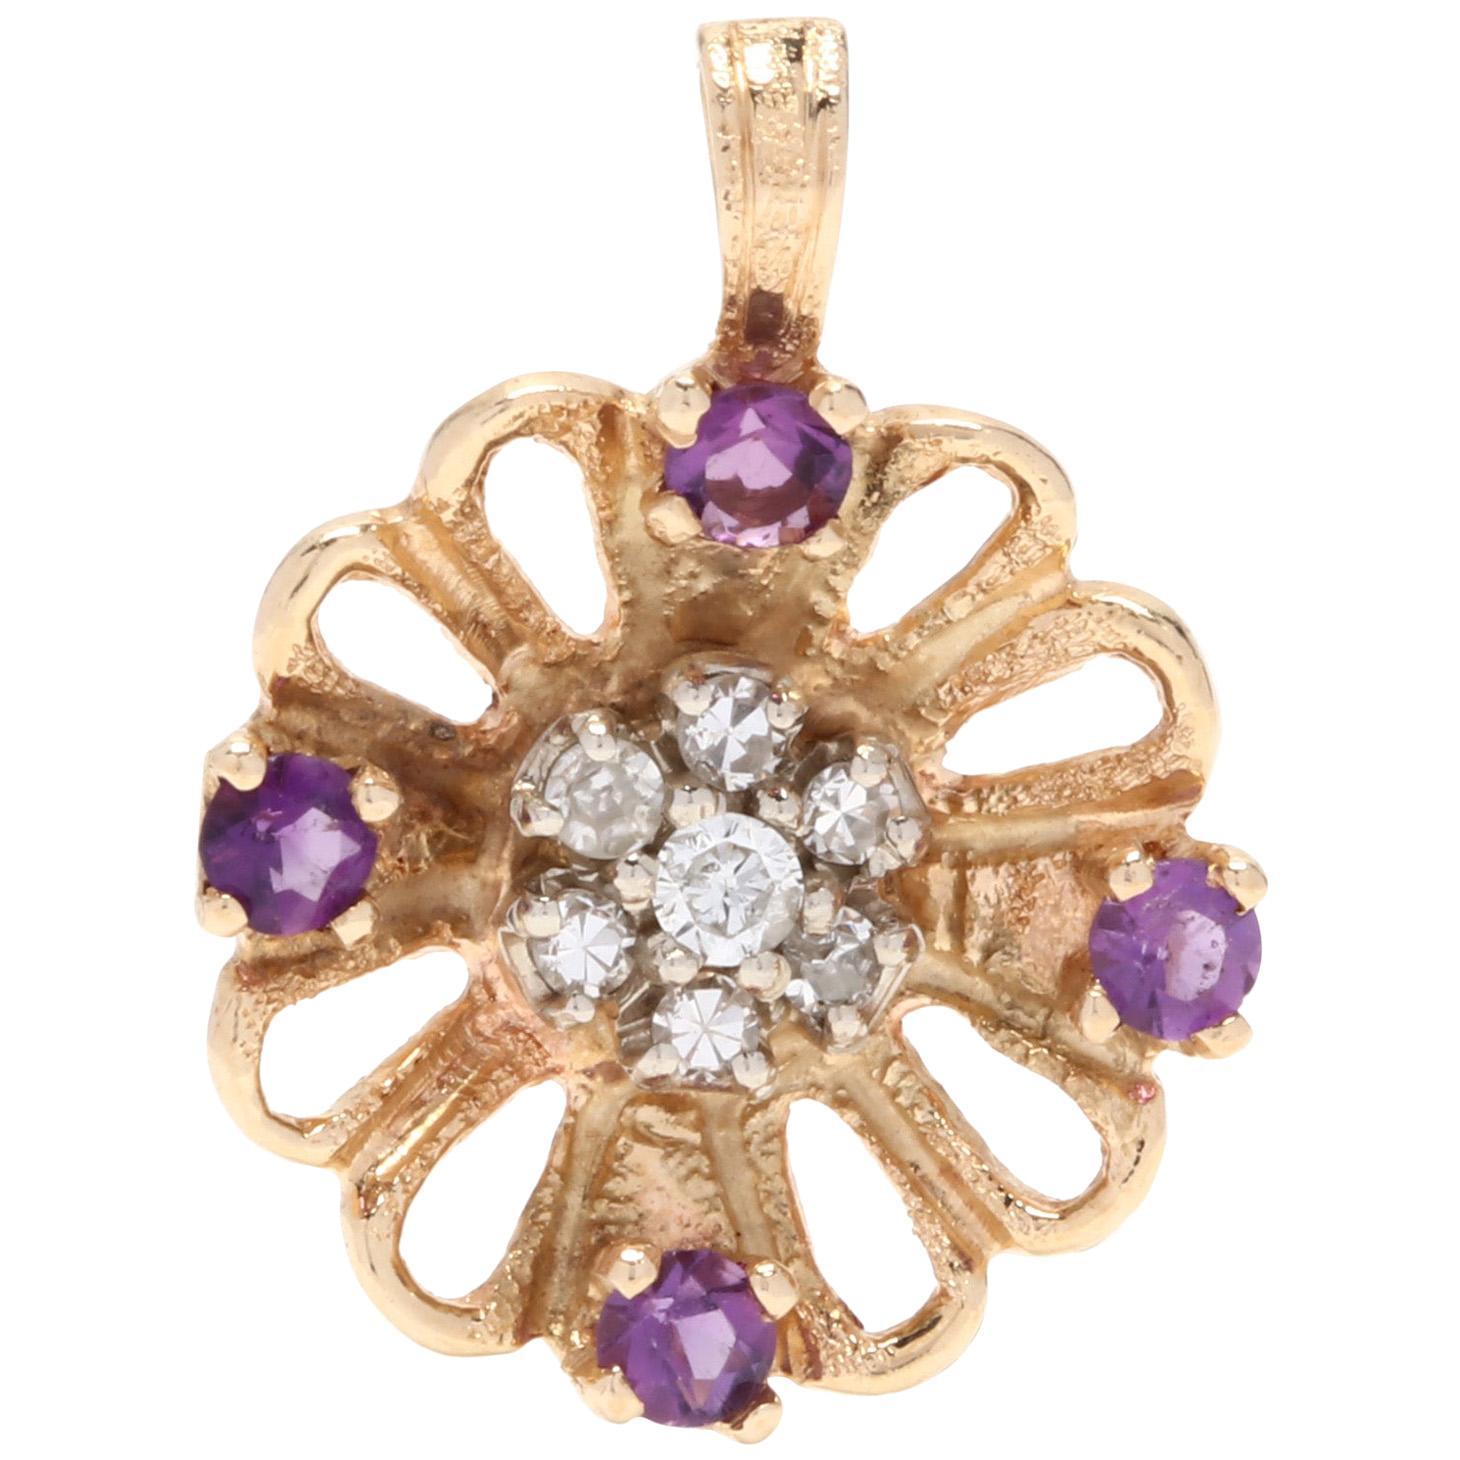 14 Karat Yellow Gold, Amethyst and Diamond Flower Charm or Pendant